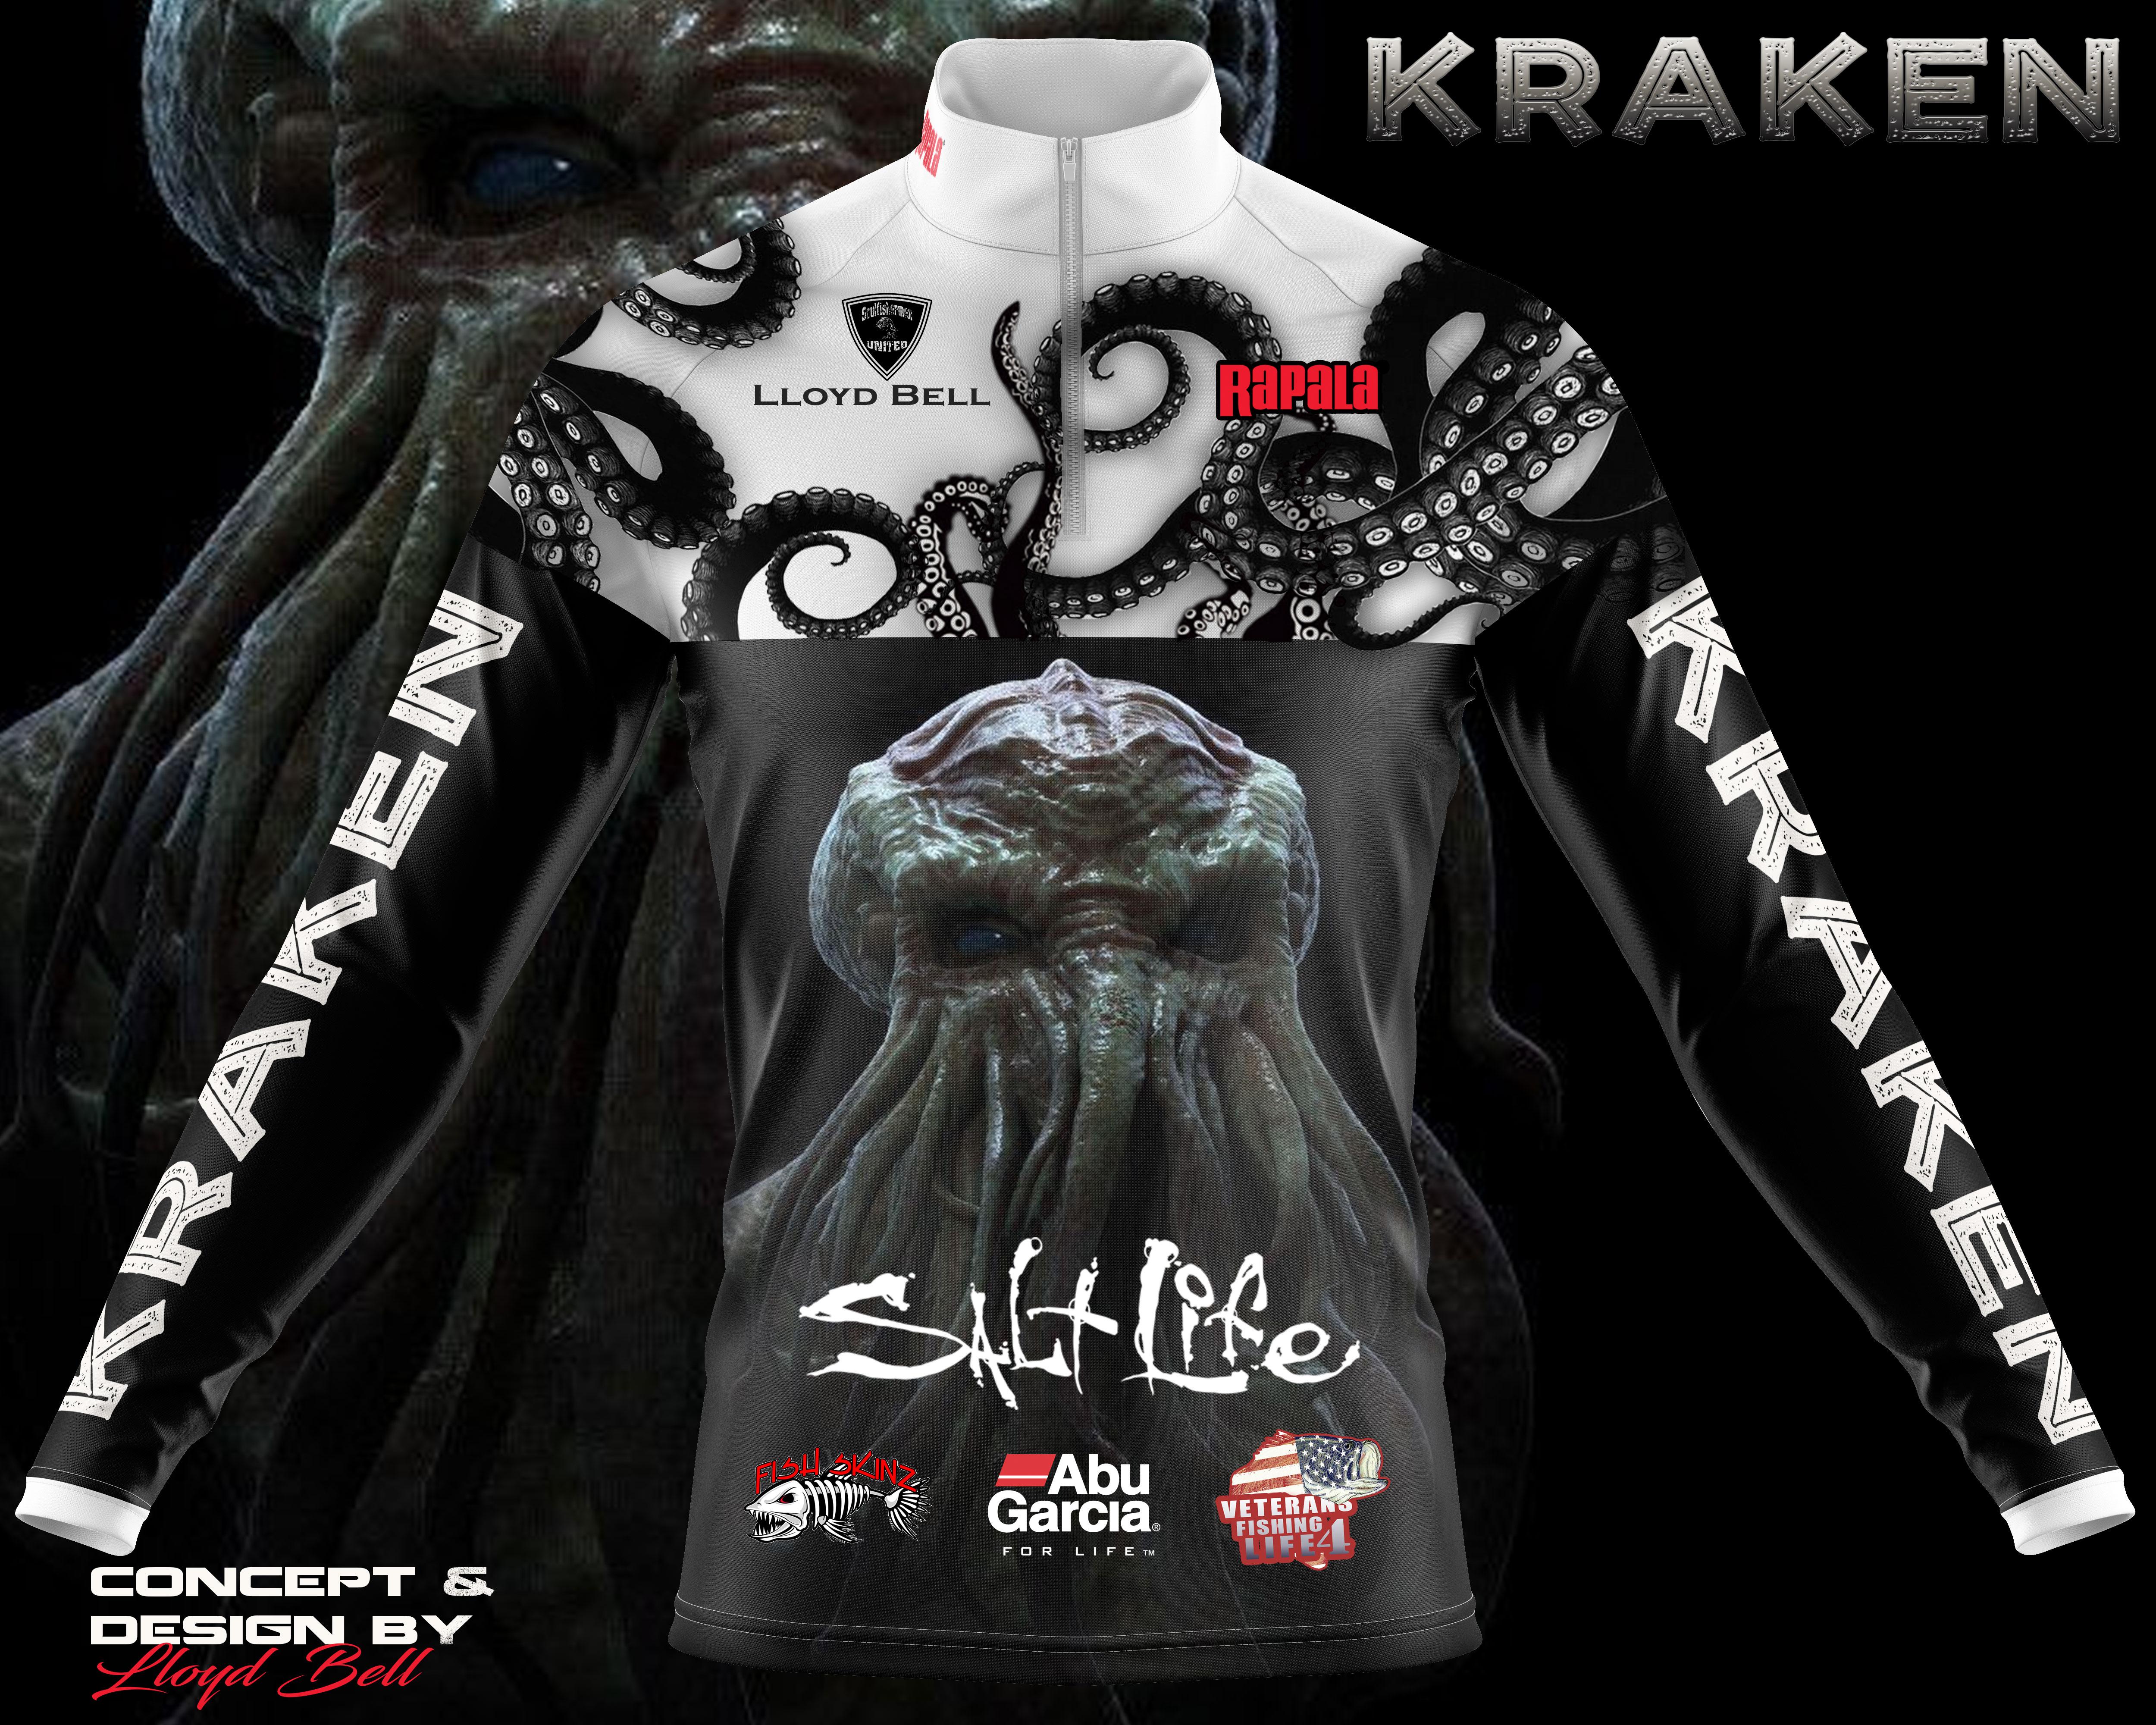 Kraken-jersey